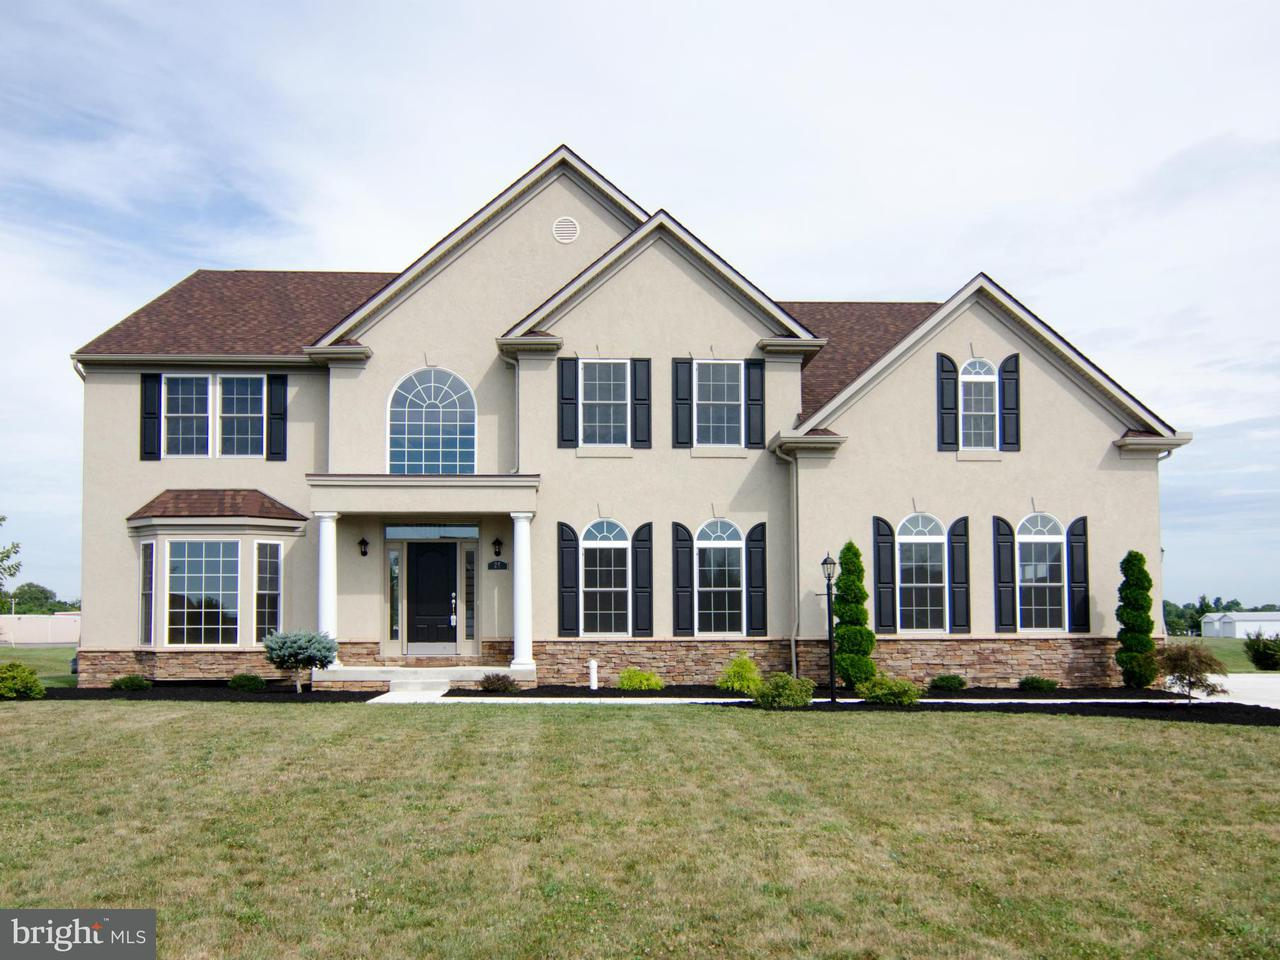 Single Family Home for Sale at 25 Celestial Ter 25 Celestial Ter Greencastle, Pennsylvania 17225 United States